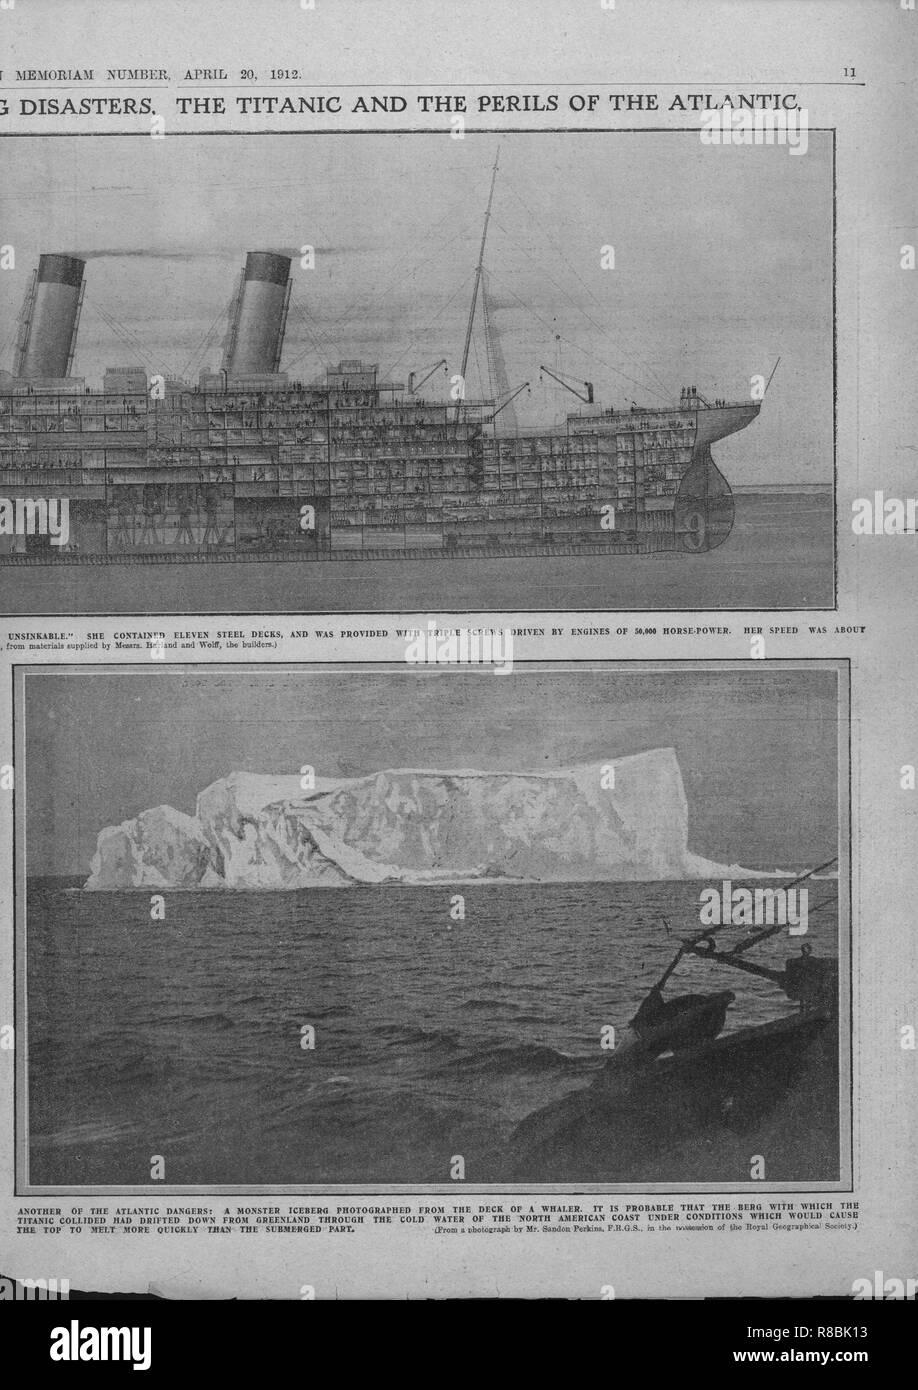 Titanic Engine Room Underwater: Sectional Diagram Of The 'Titanic', And Iceberg, April 20